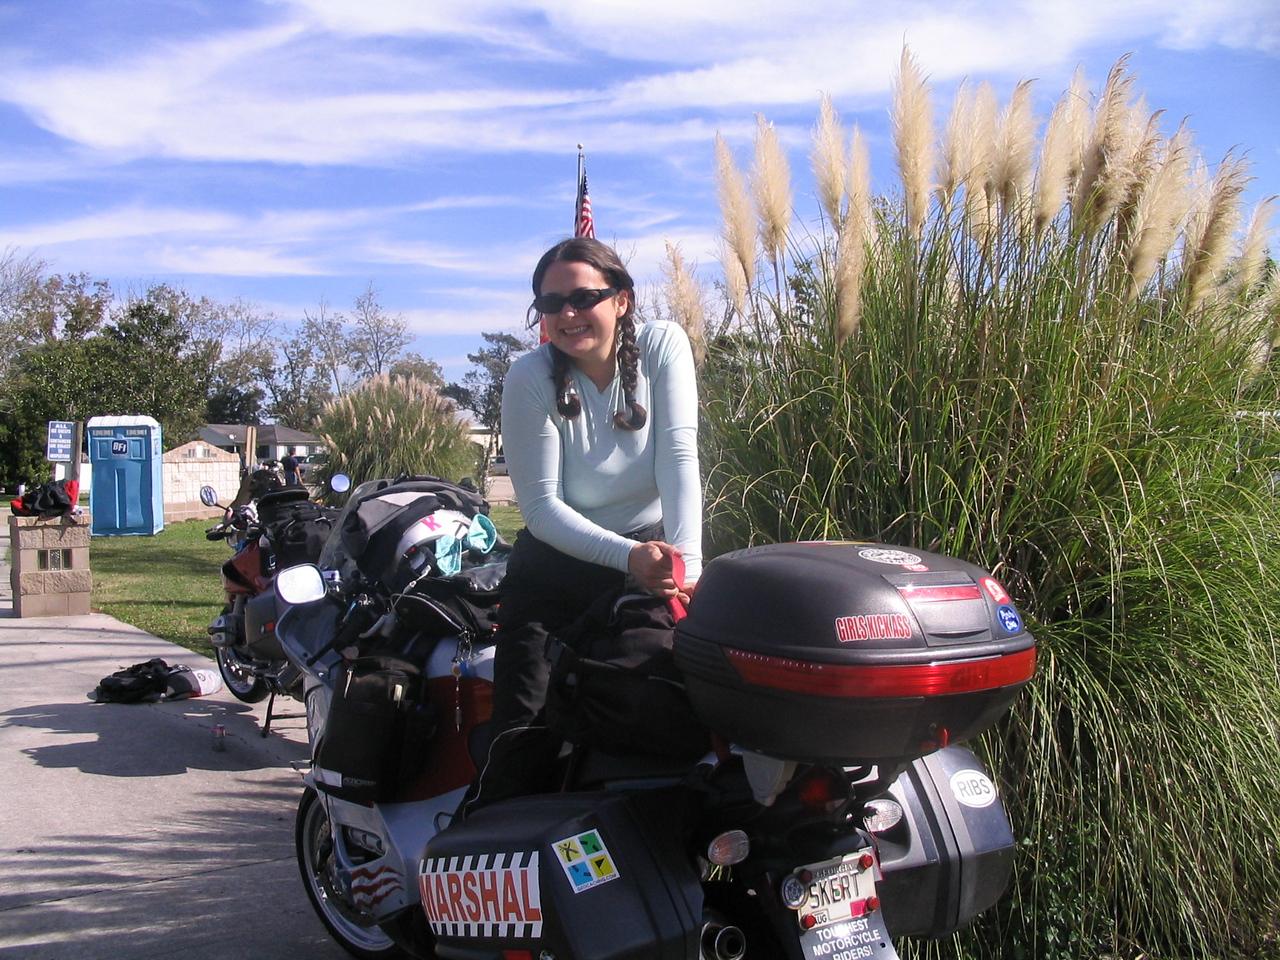 Lins riding my bike at Cajun rally